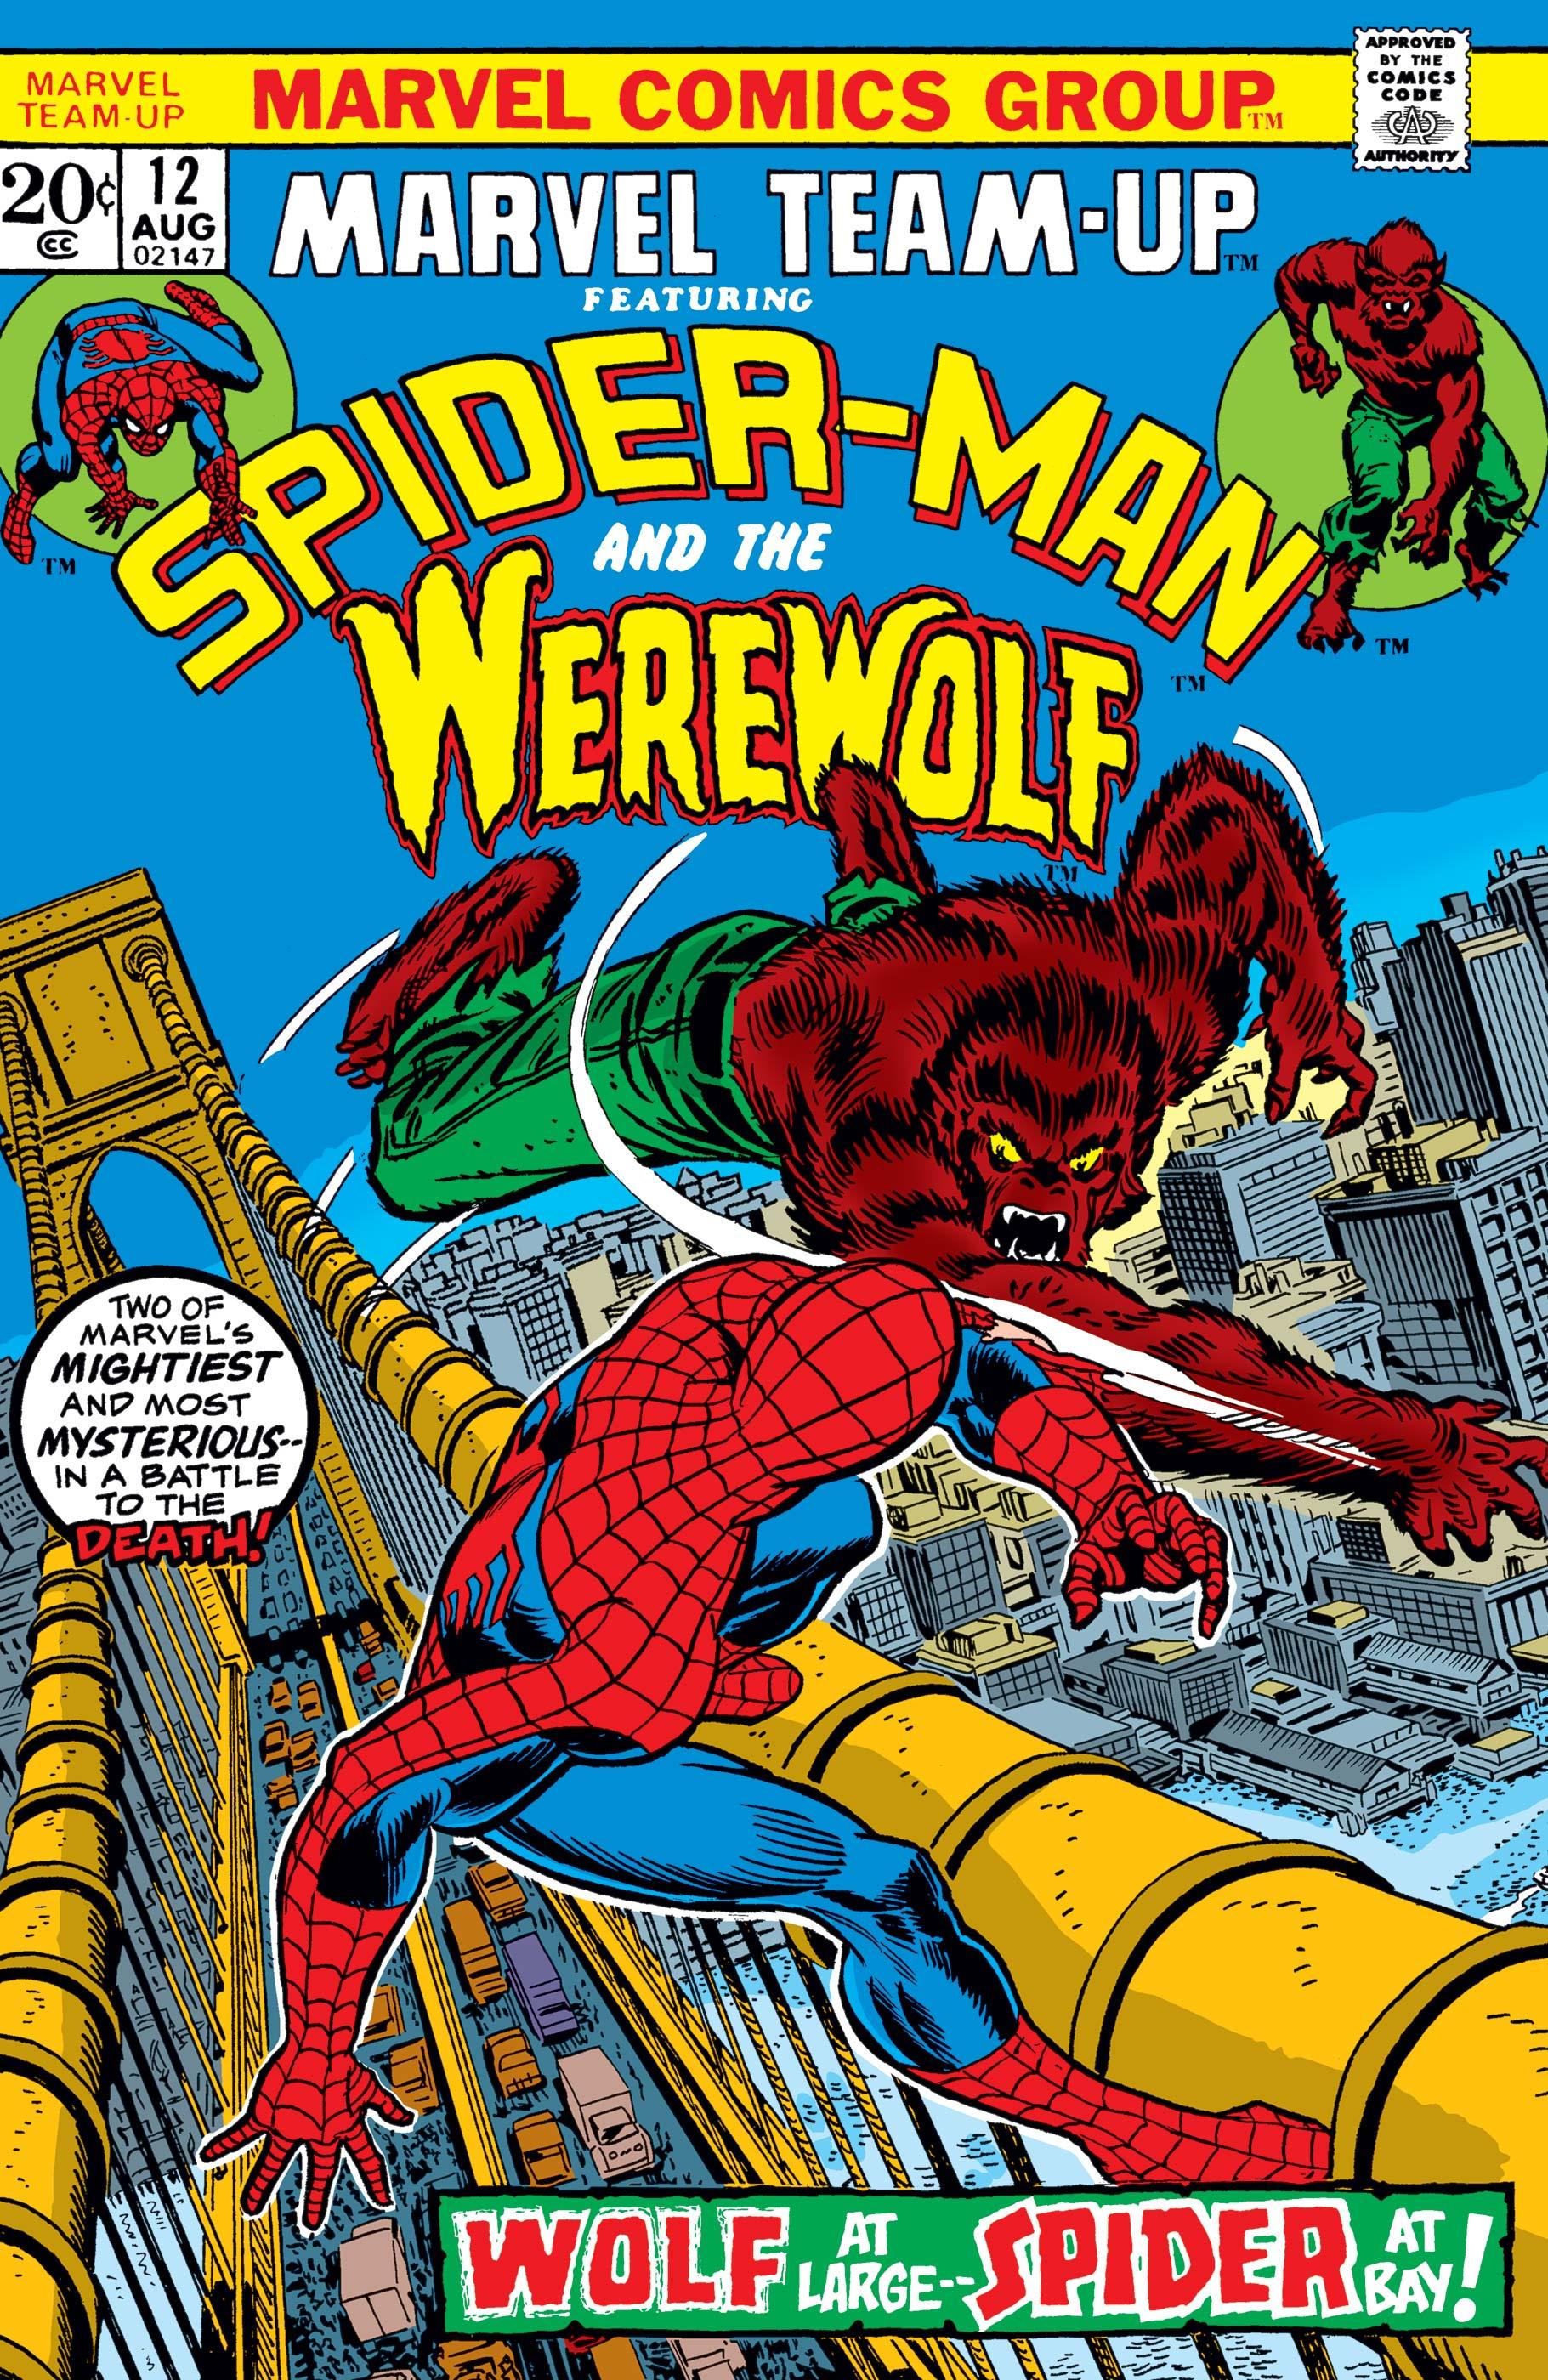 Marvel Team-Up (1972) #12